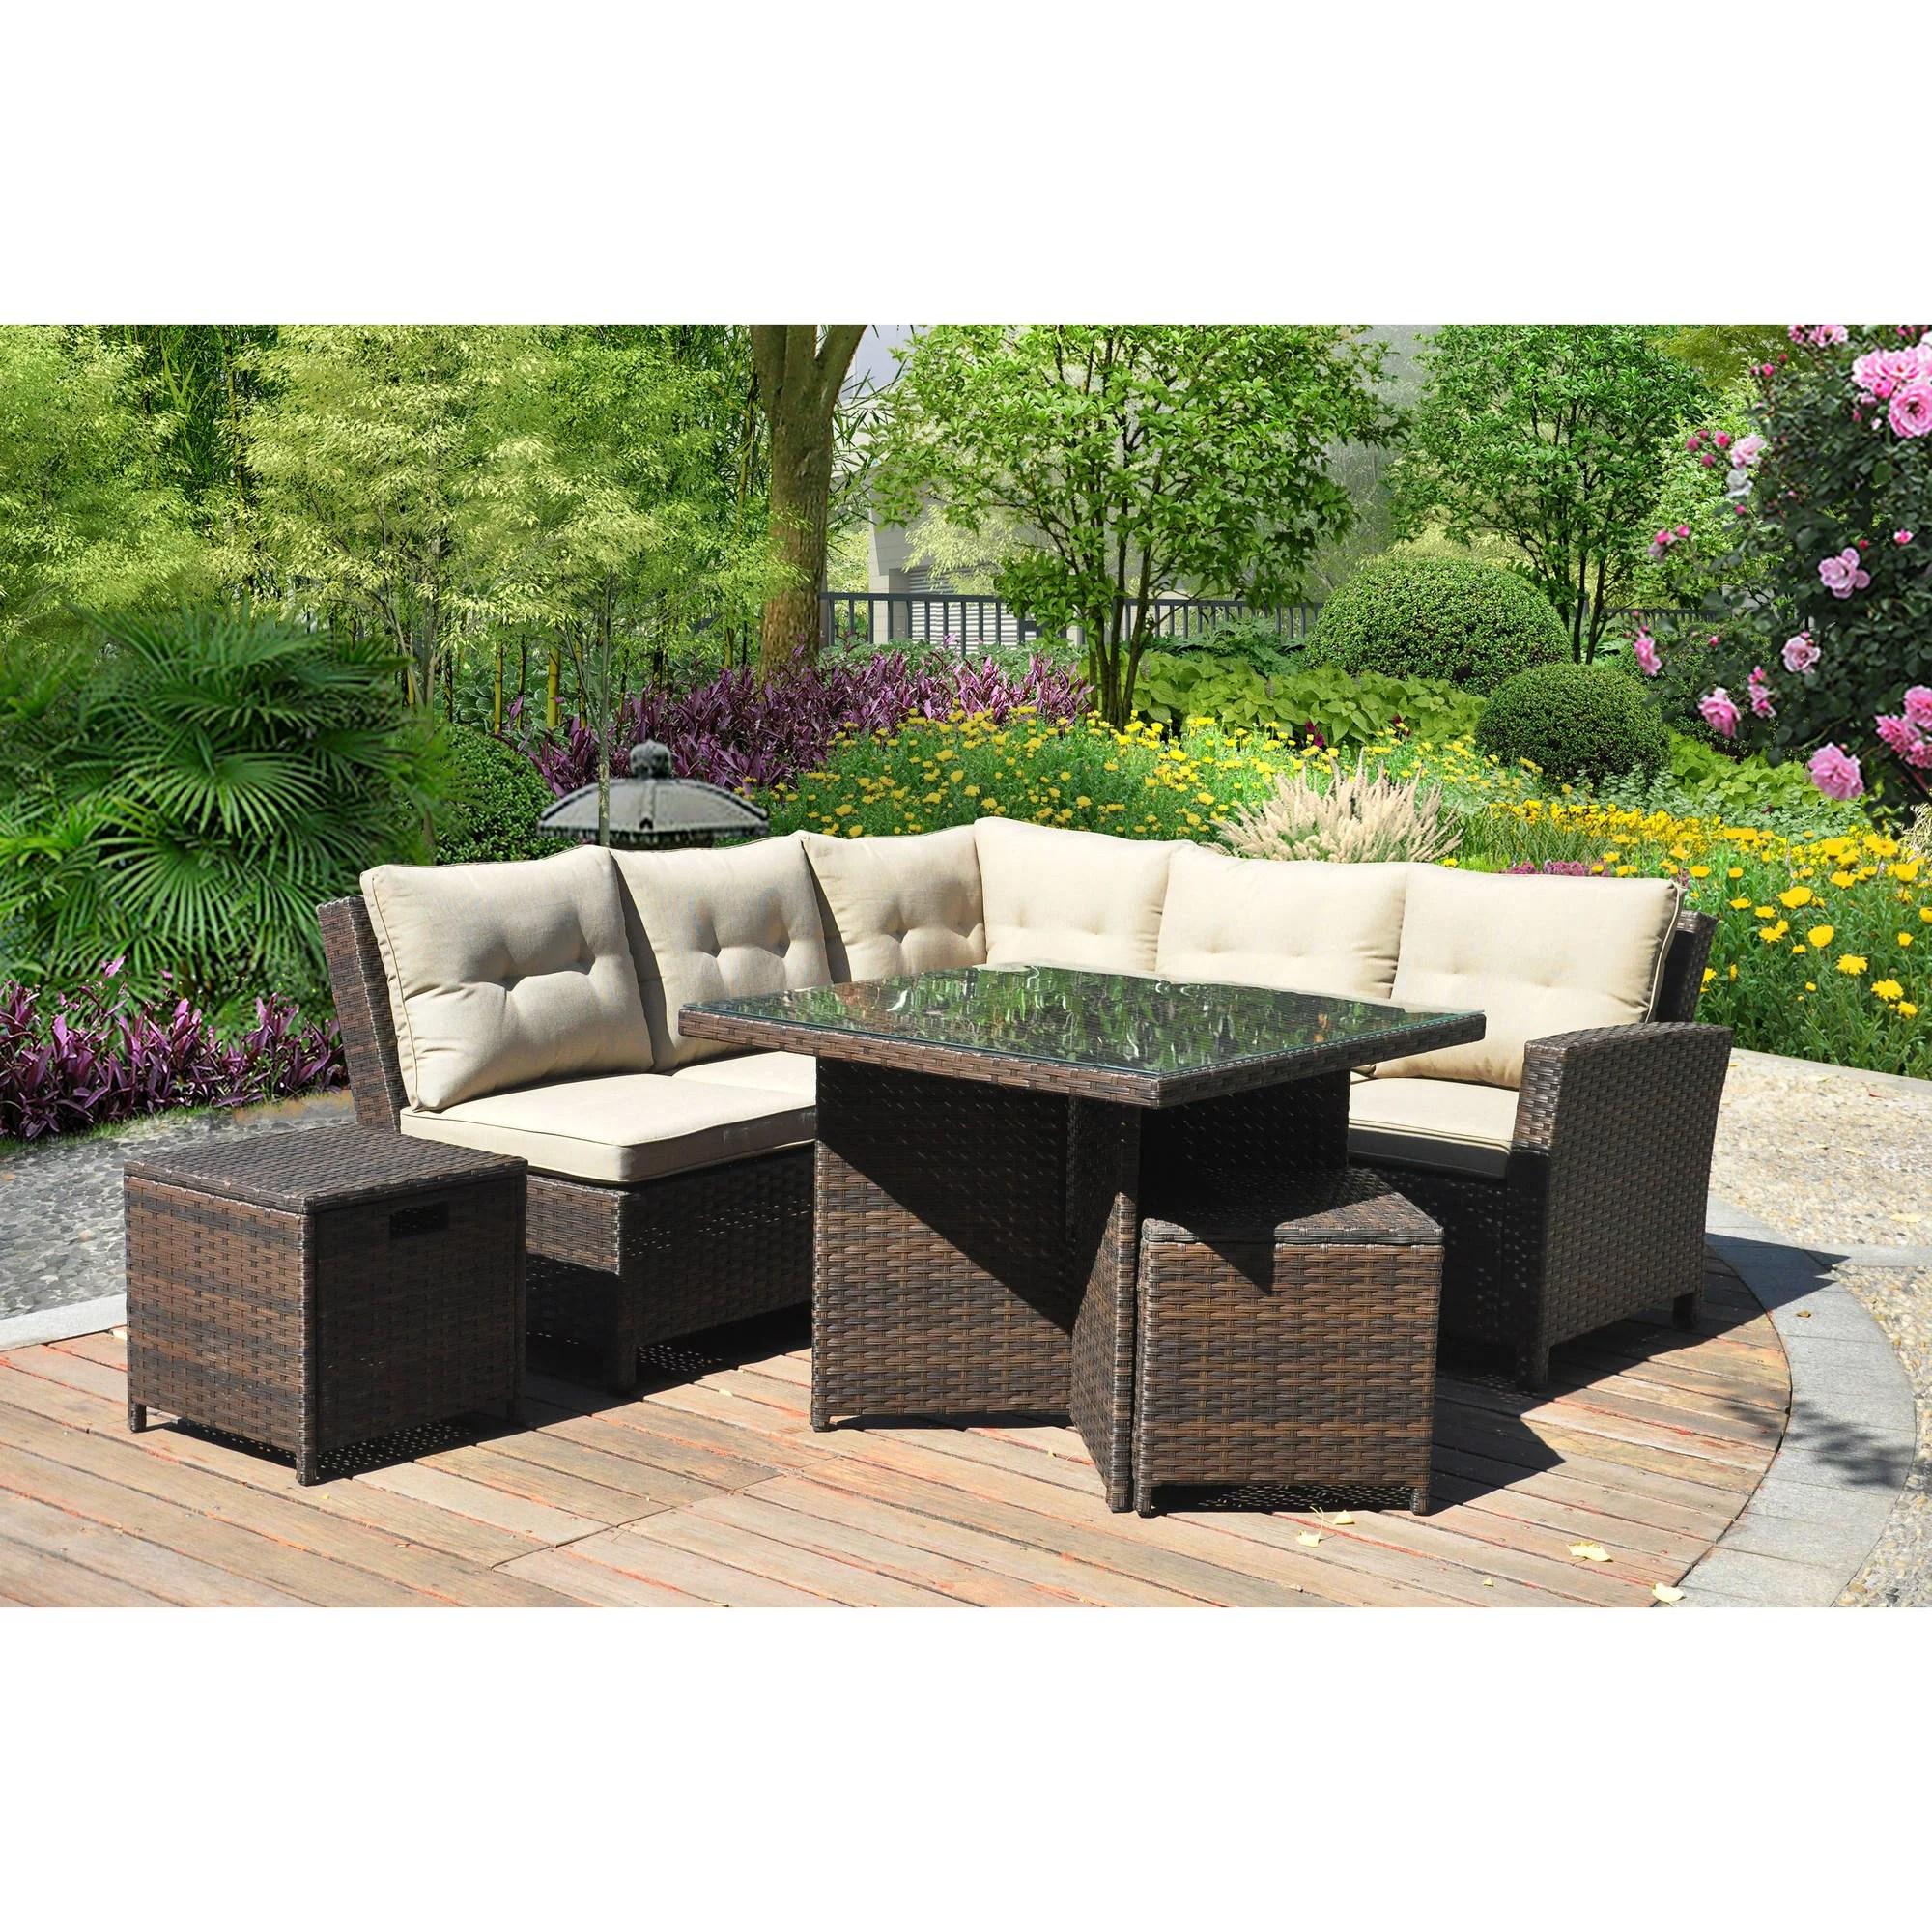 better homes and gardens baytown 5 piece woven sectional sofa set seats 5 walmart com